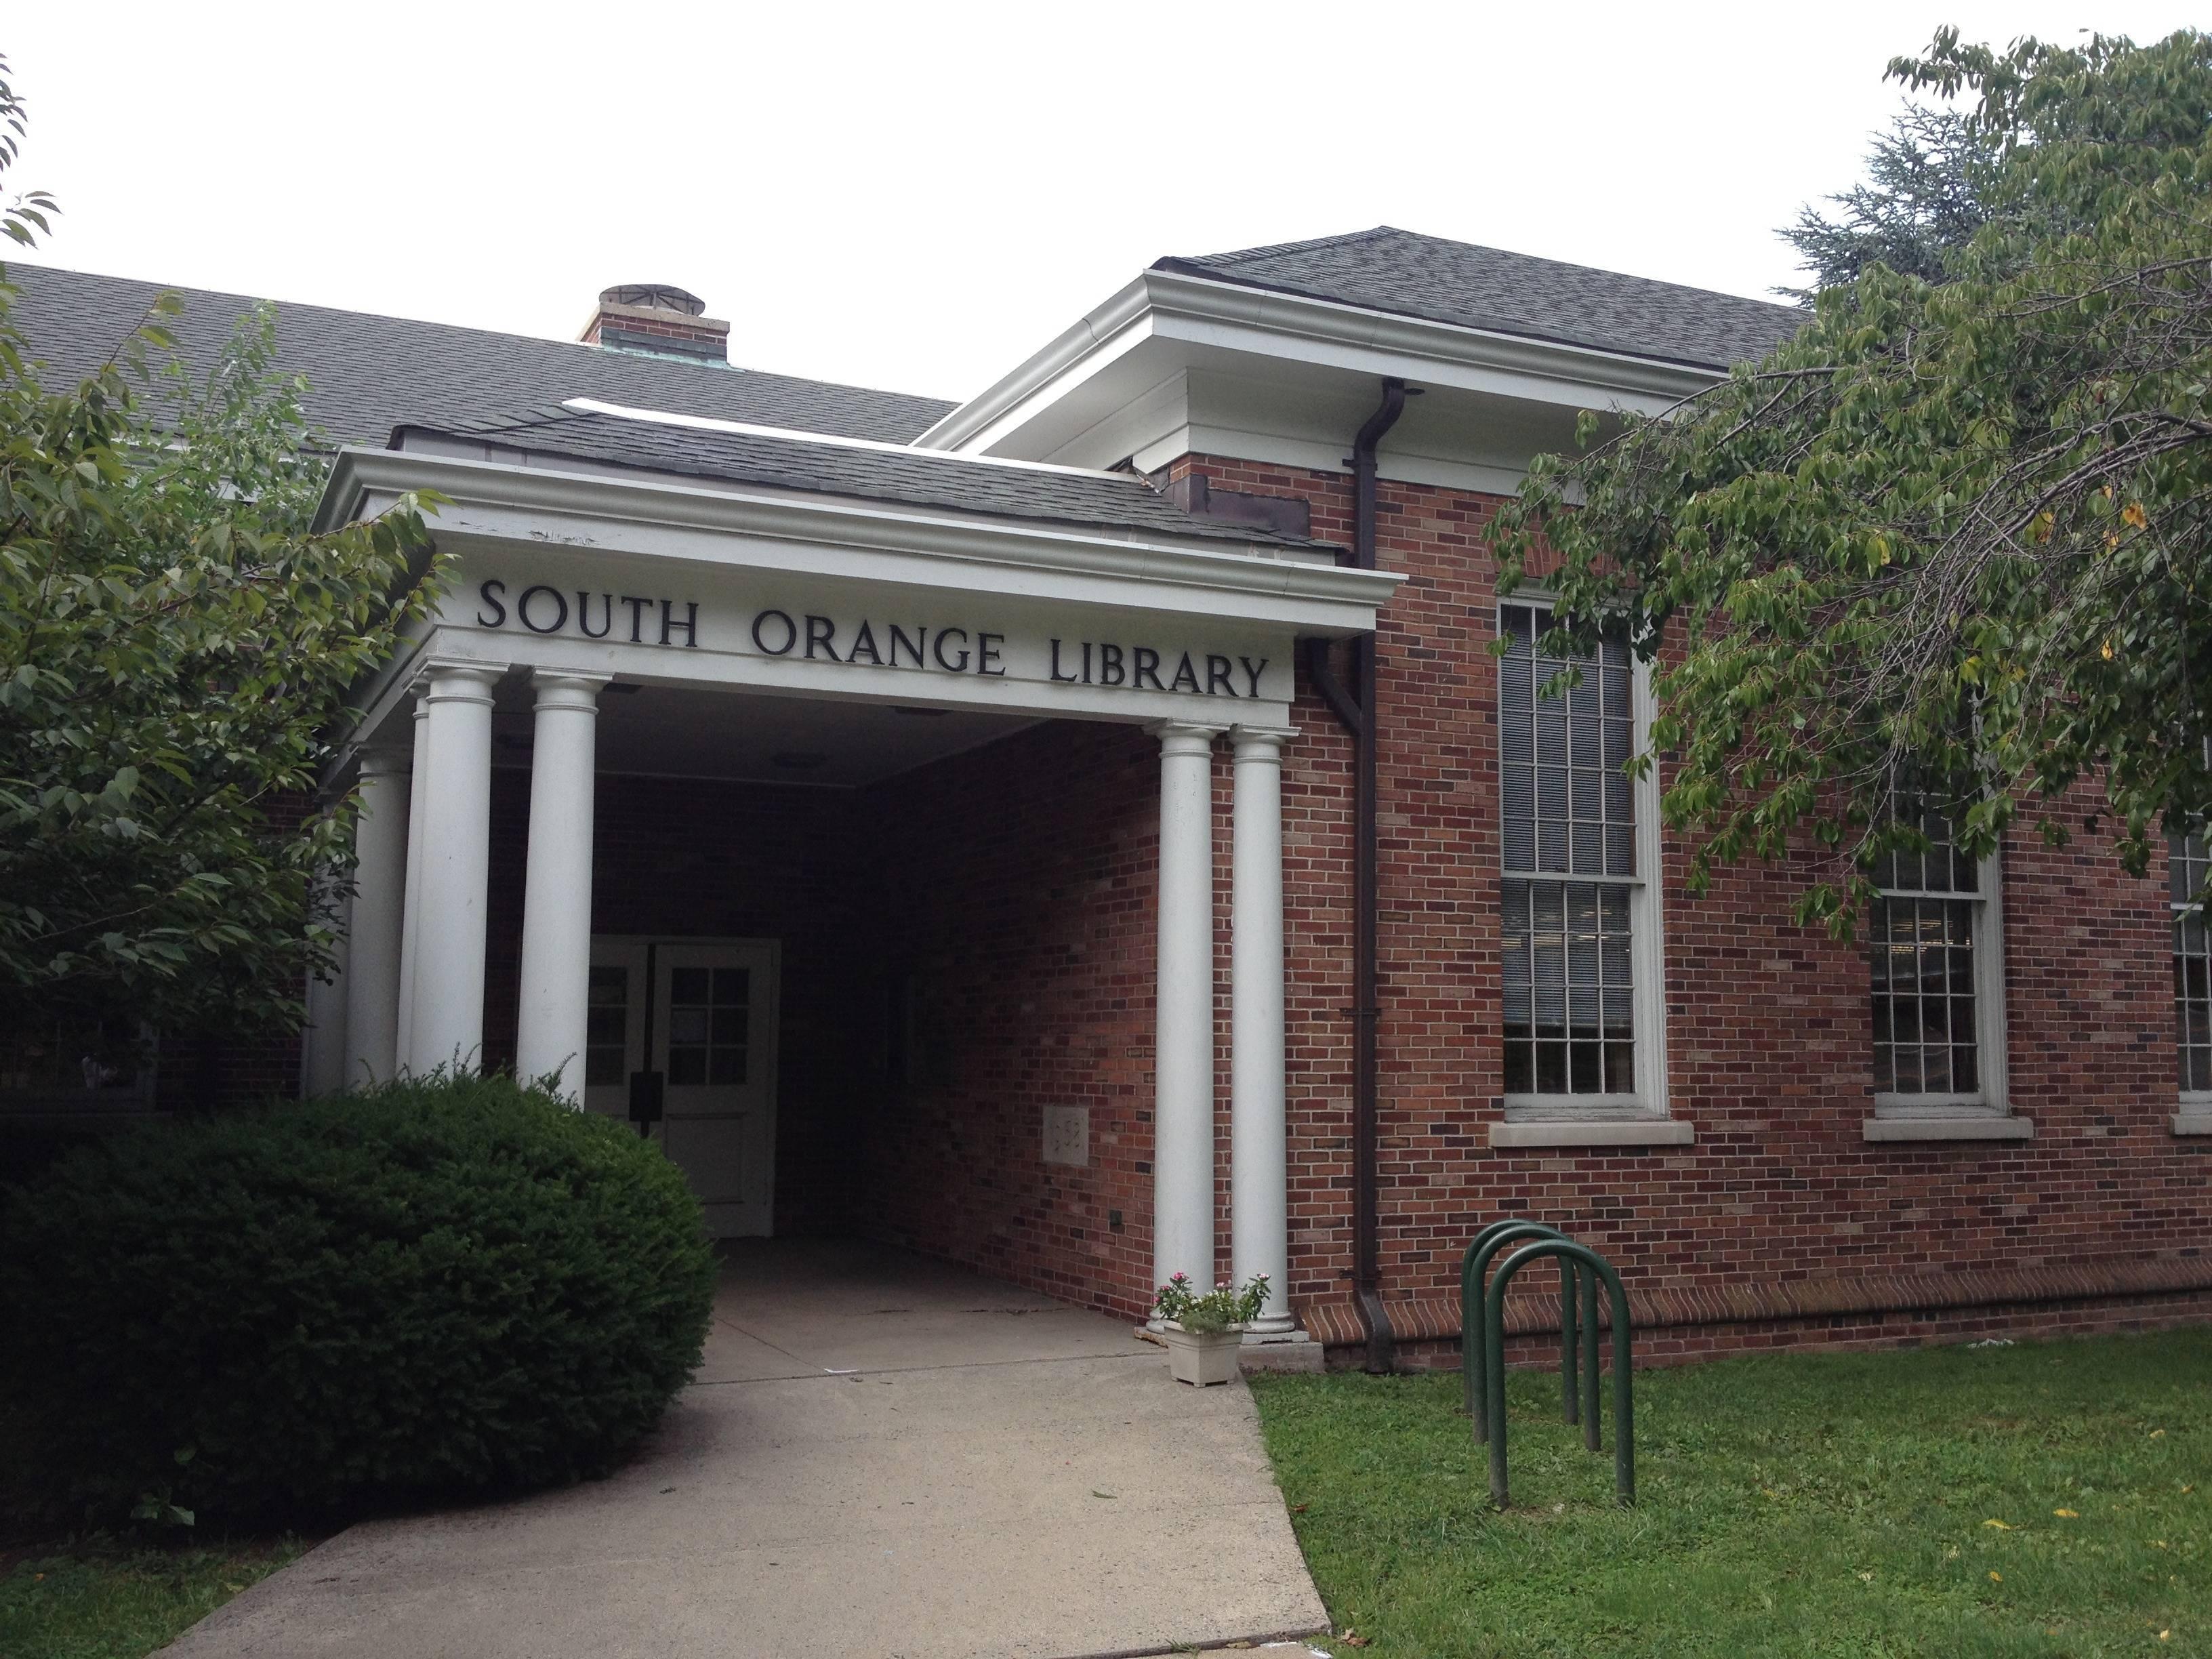 a7b520d08c63f9d77945_South_Orange_Library.JPG